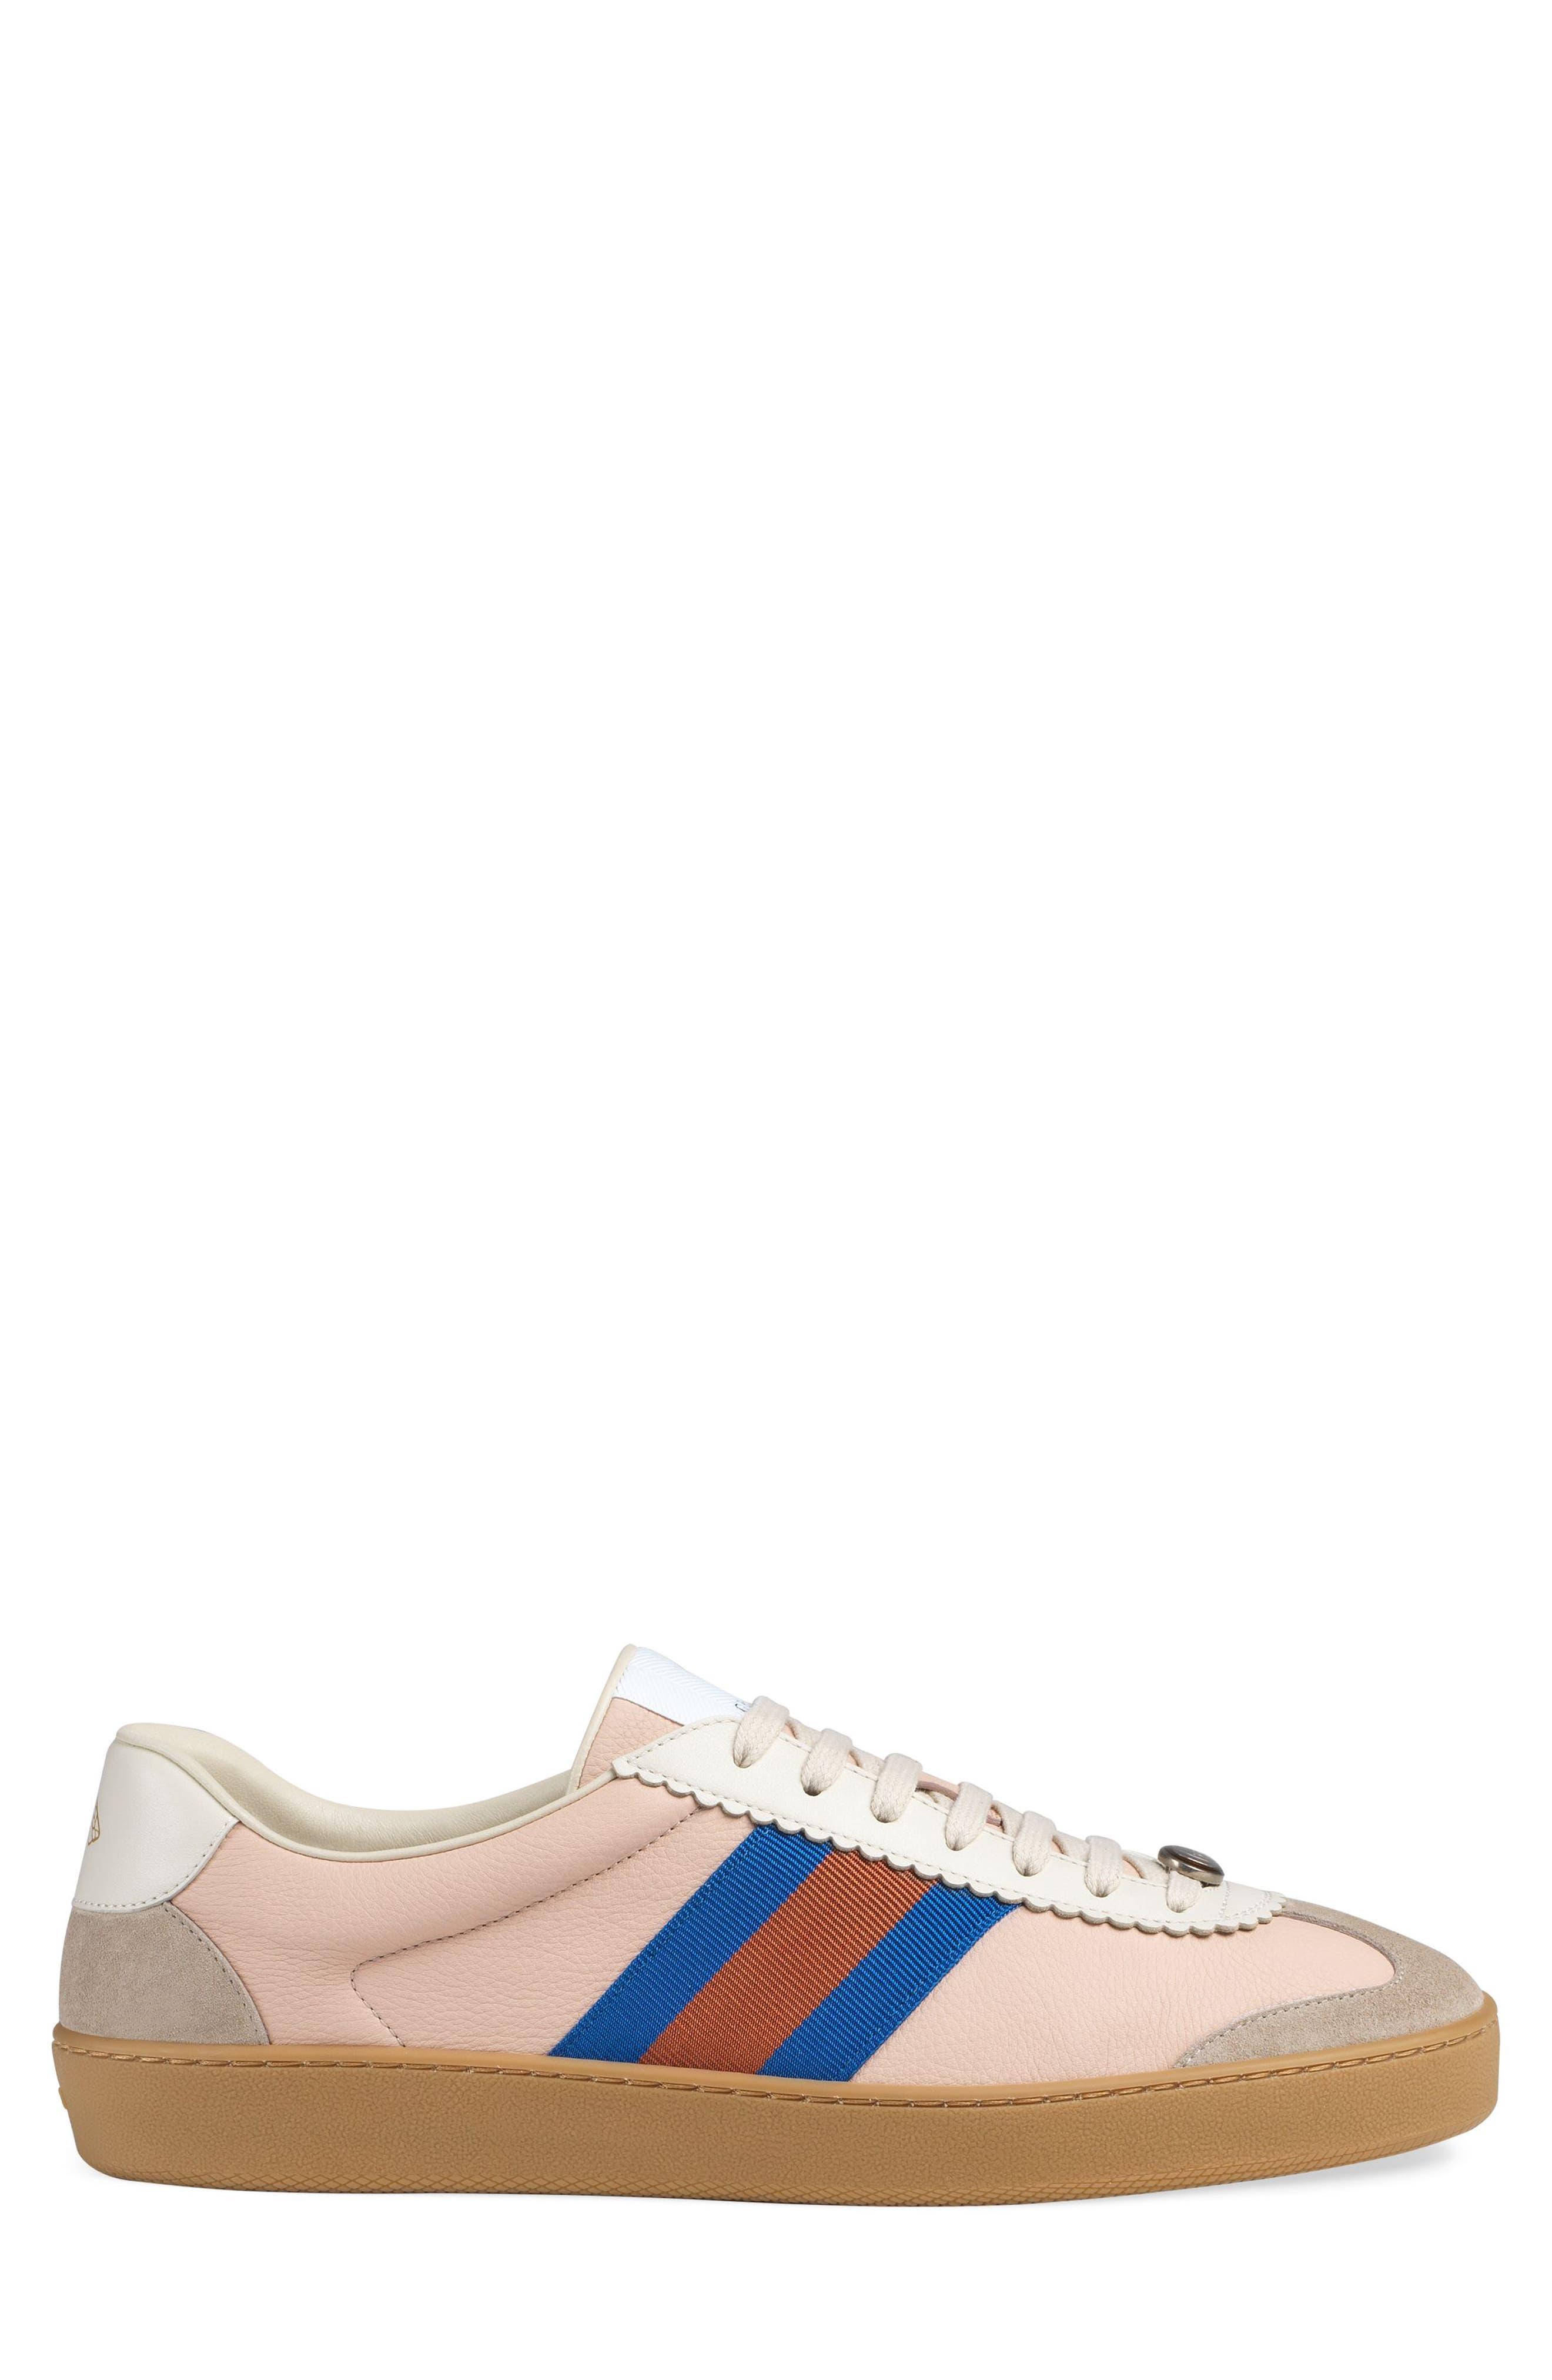 Web Sneaker,                             Alternate thumbnail 2, color,                             OATMEAL/ WHITE